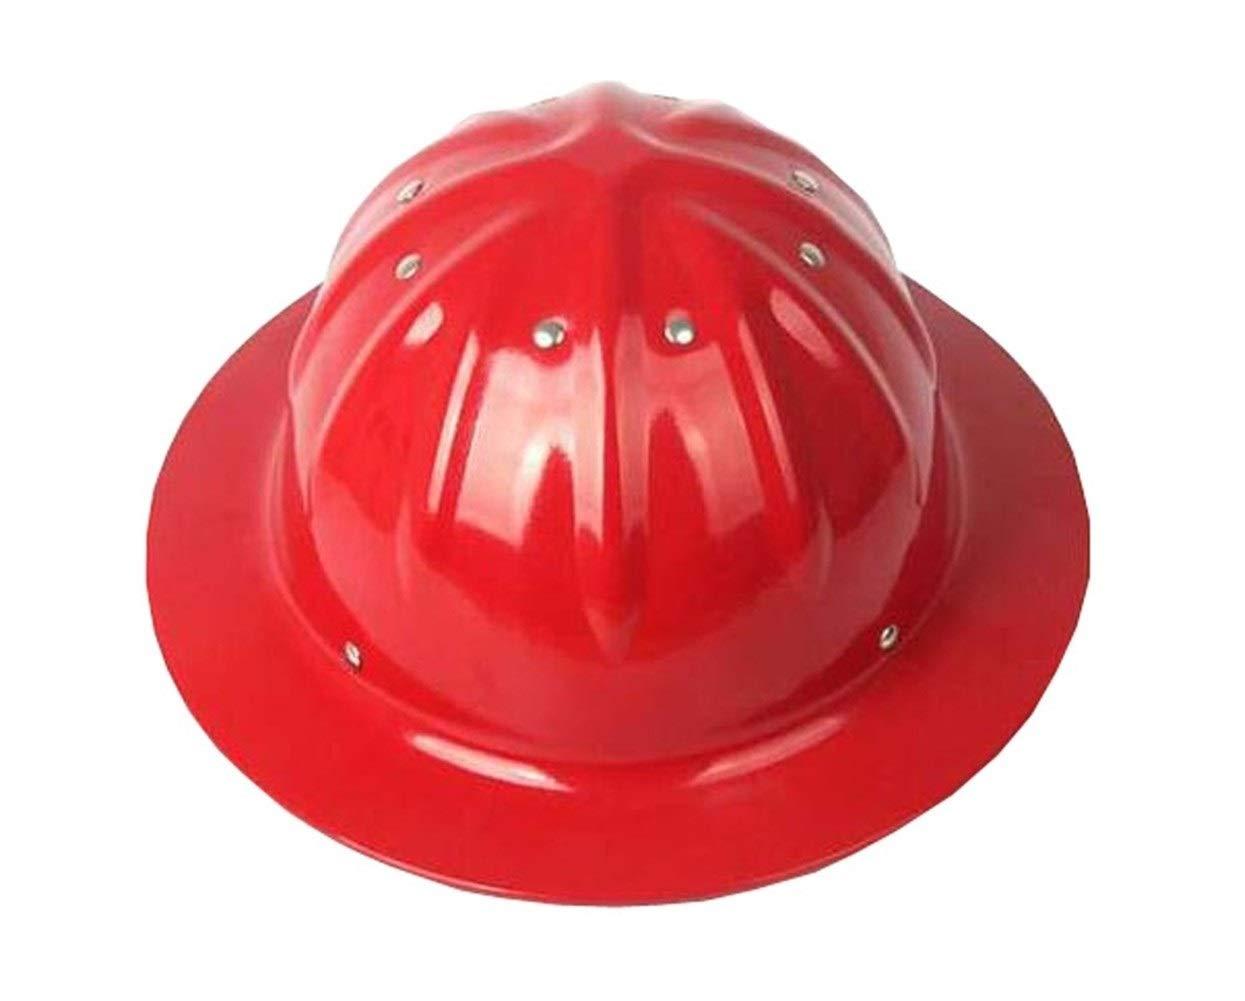 Aluminiumhelm,Aluminium Helm Au/ßenhelm Sonnenschutz Sonnenschutz Farbe : Red Aluminium Hard H/üte Bau Helme